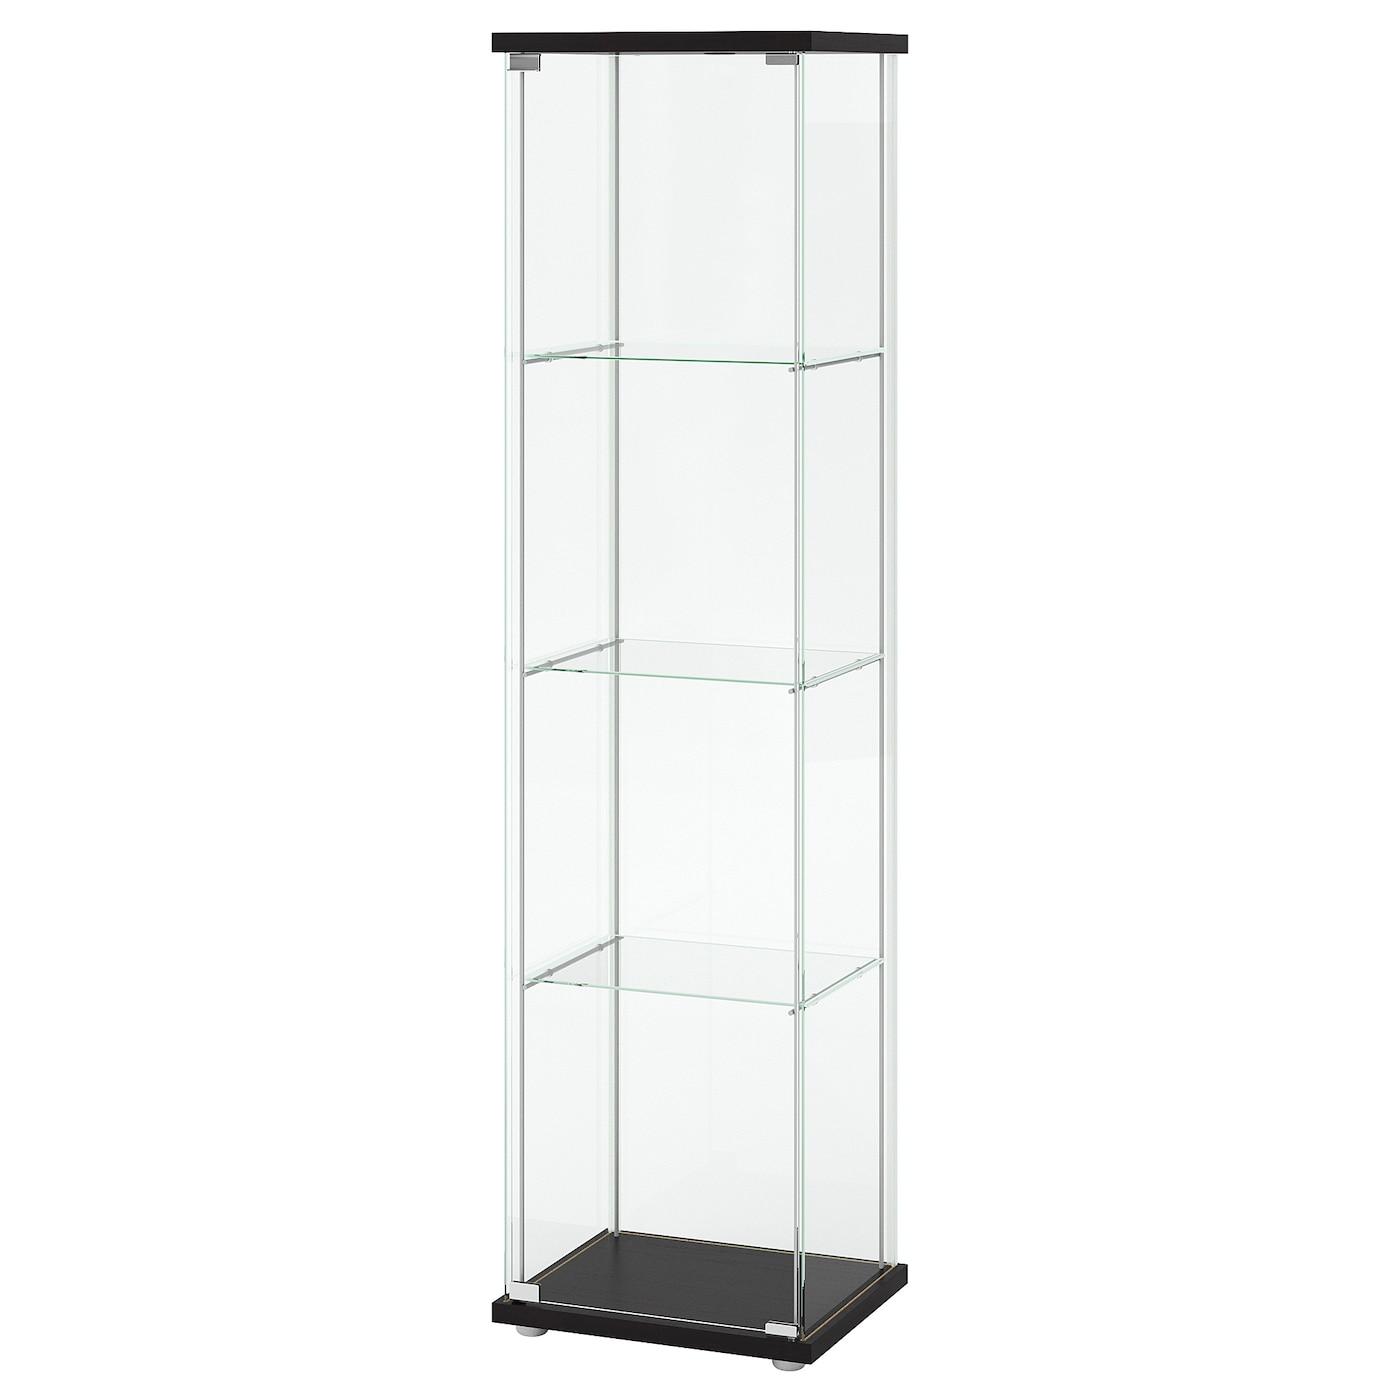 detolf vitrinekast zwartbruin 43 x 163 cm ikea. Black Bedroom Furniture Sets. Home Design Ideas